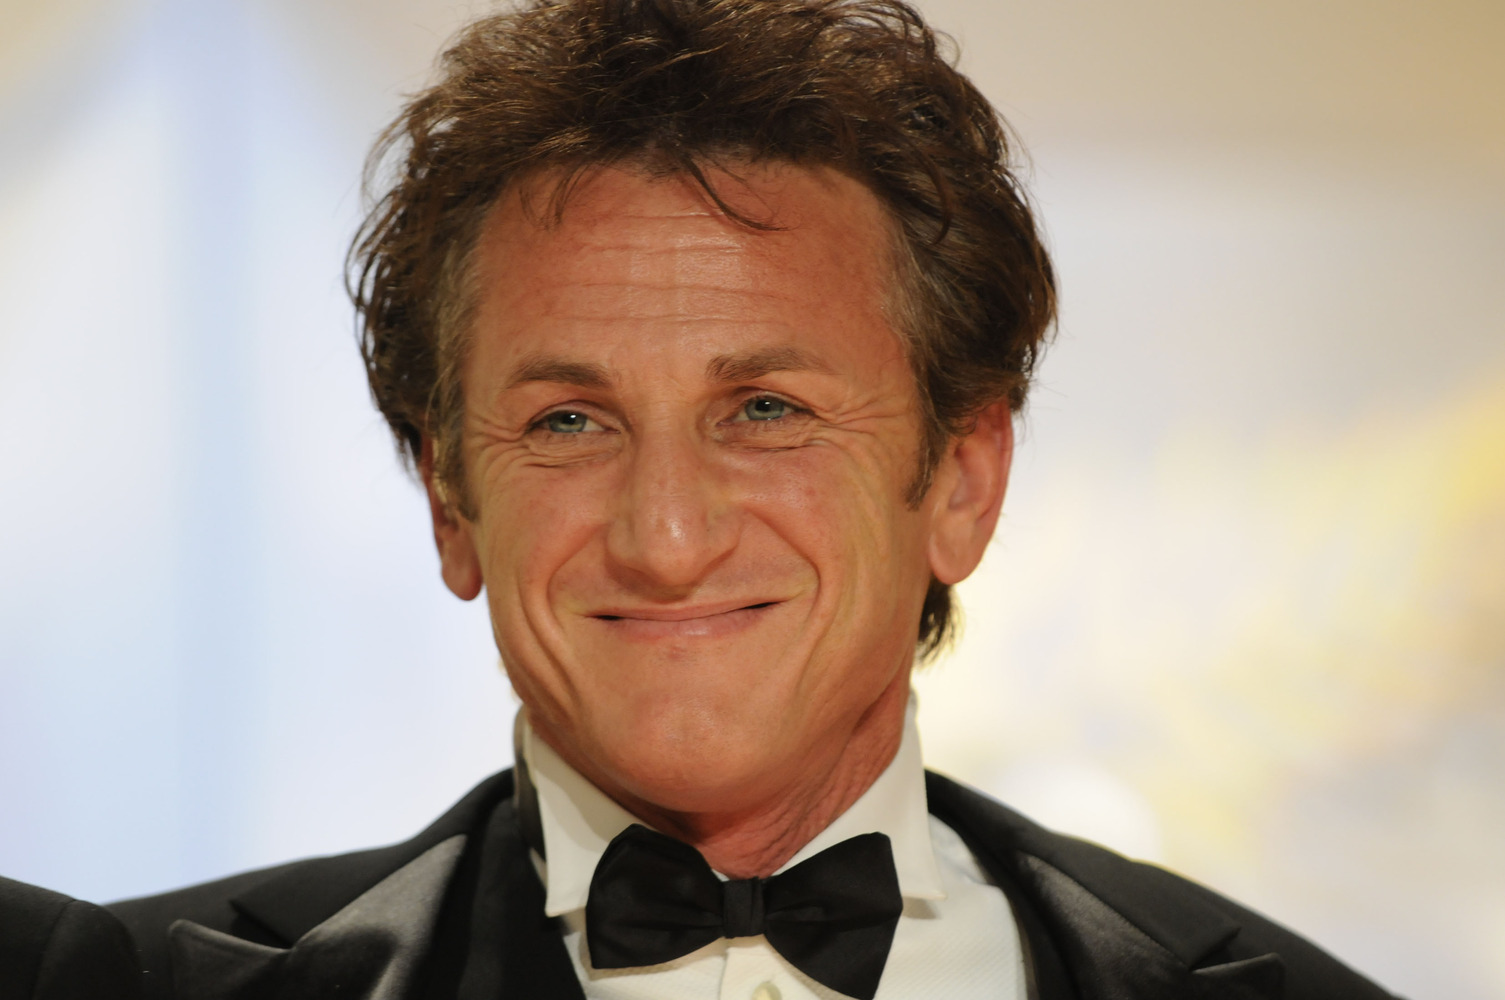 Sean Penn Profile